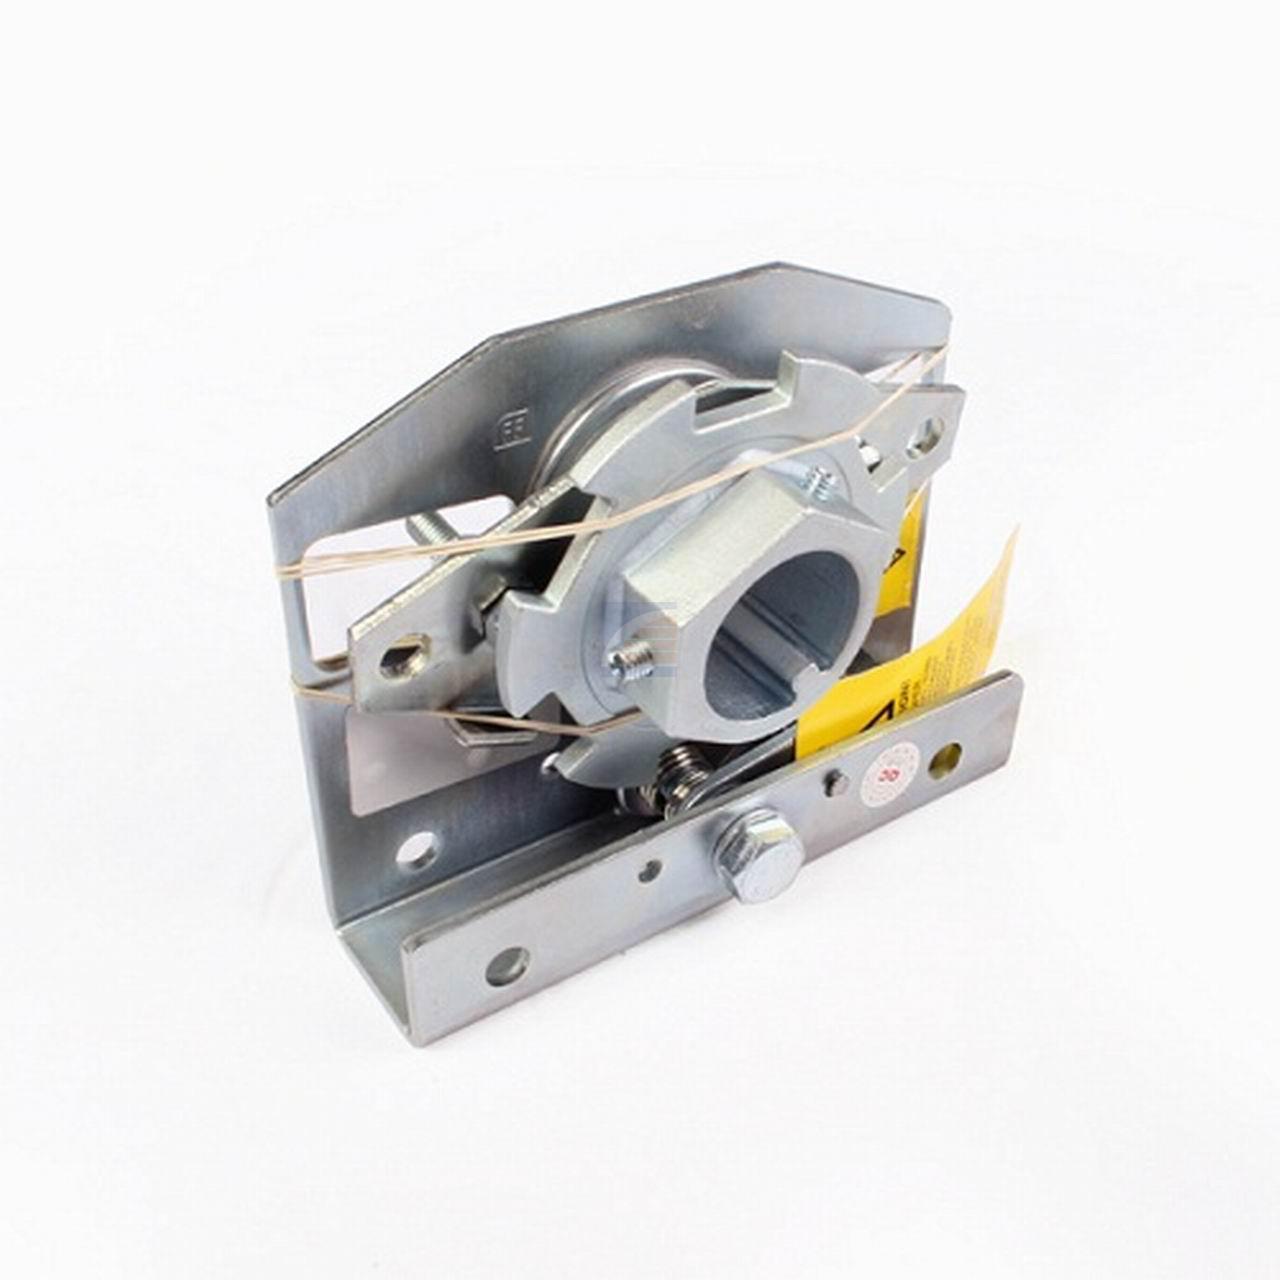 Veerbreukbeveiliging passend op de Hörmann 40mm as